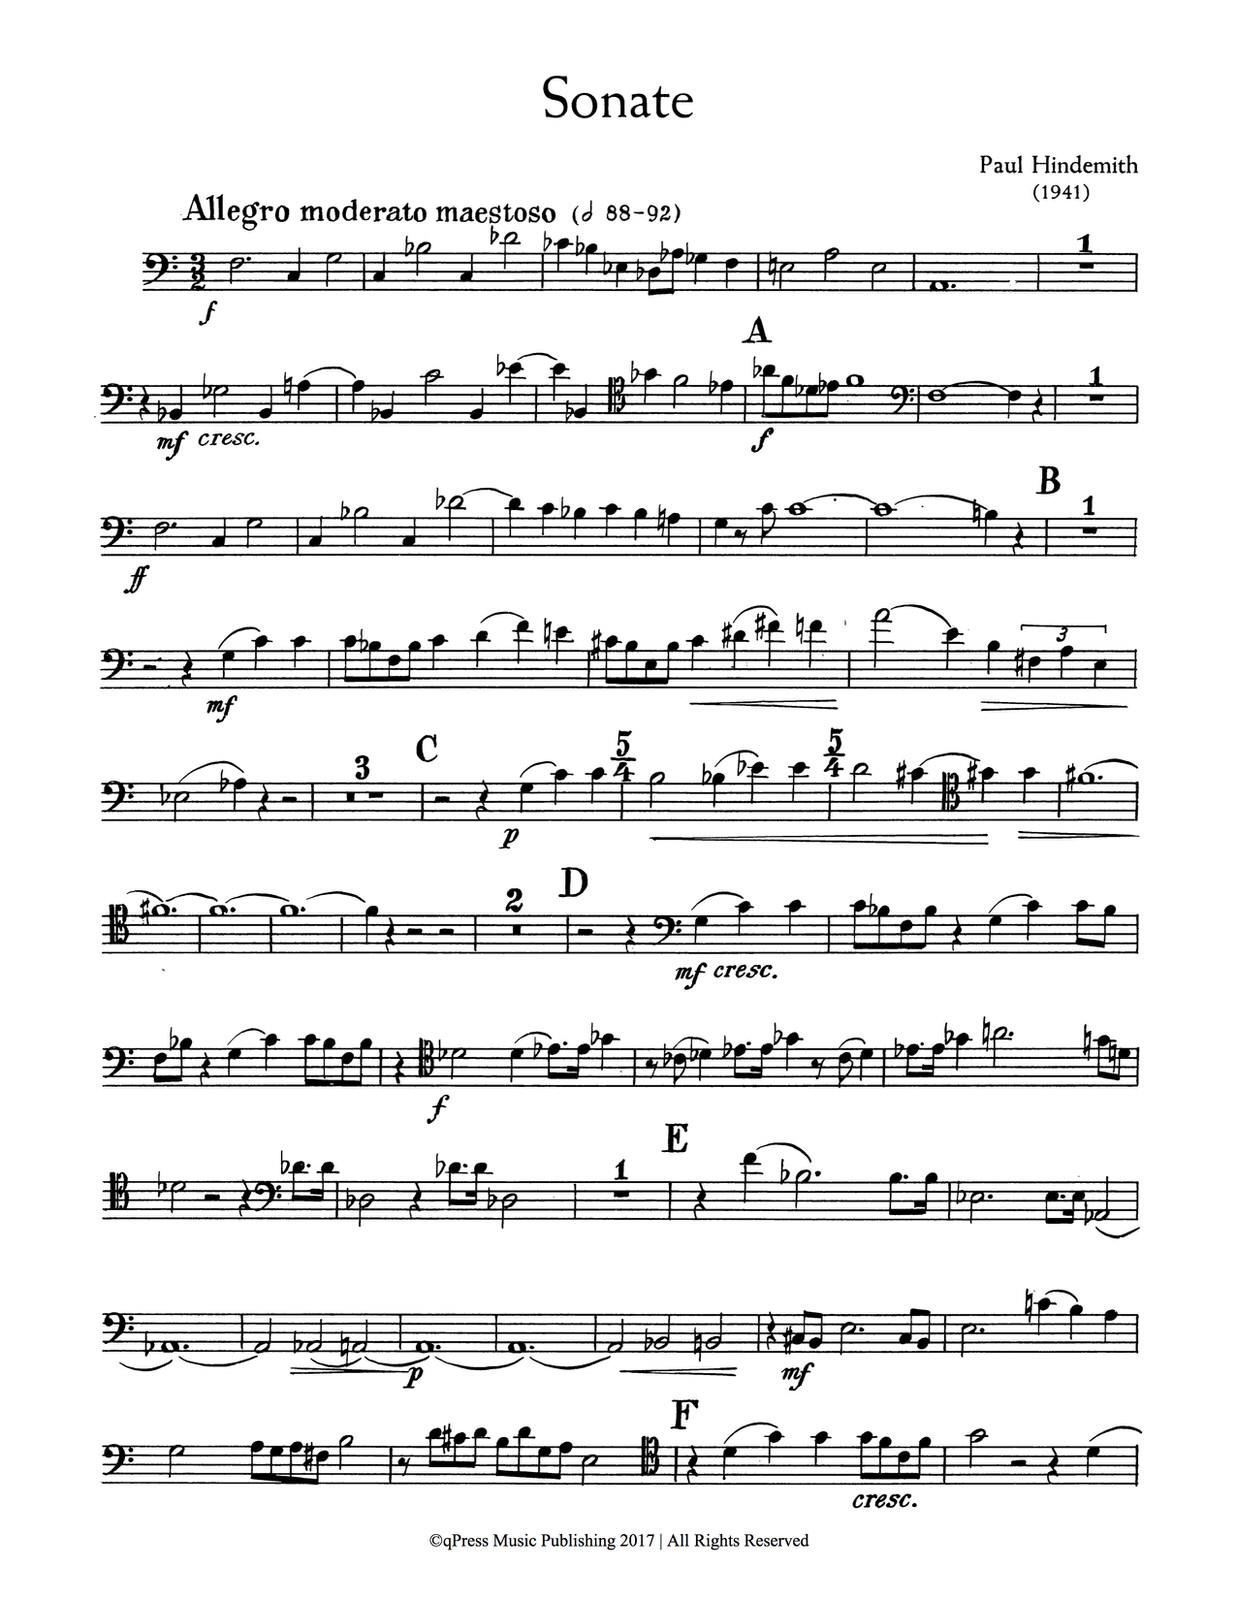 hindemith-sonata-for-trombone-complete-2